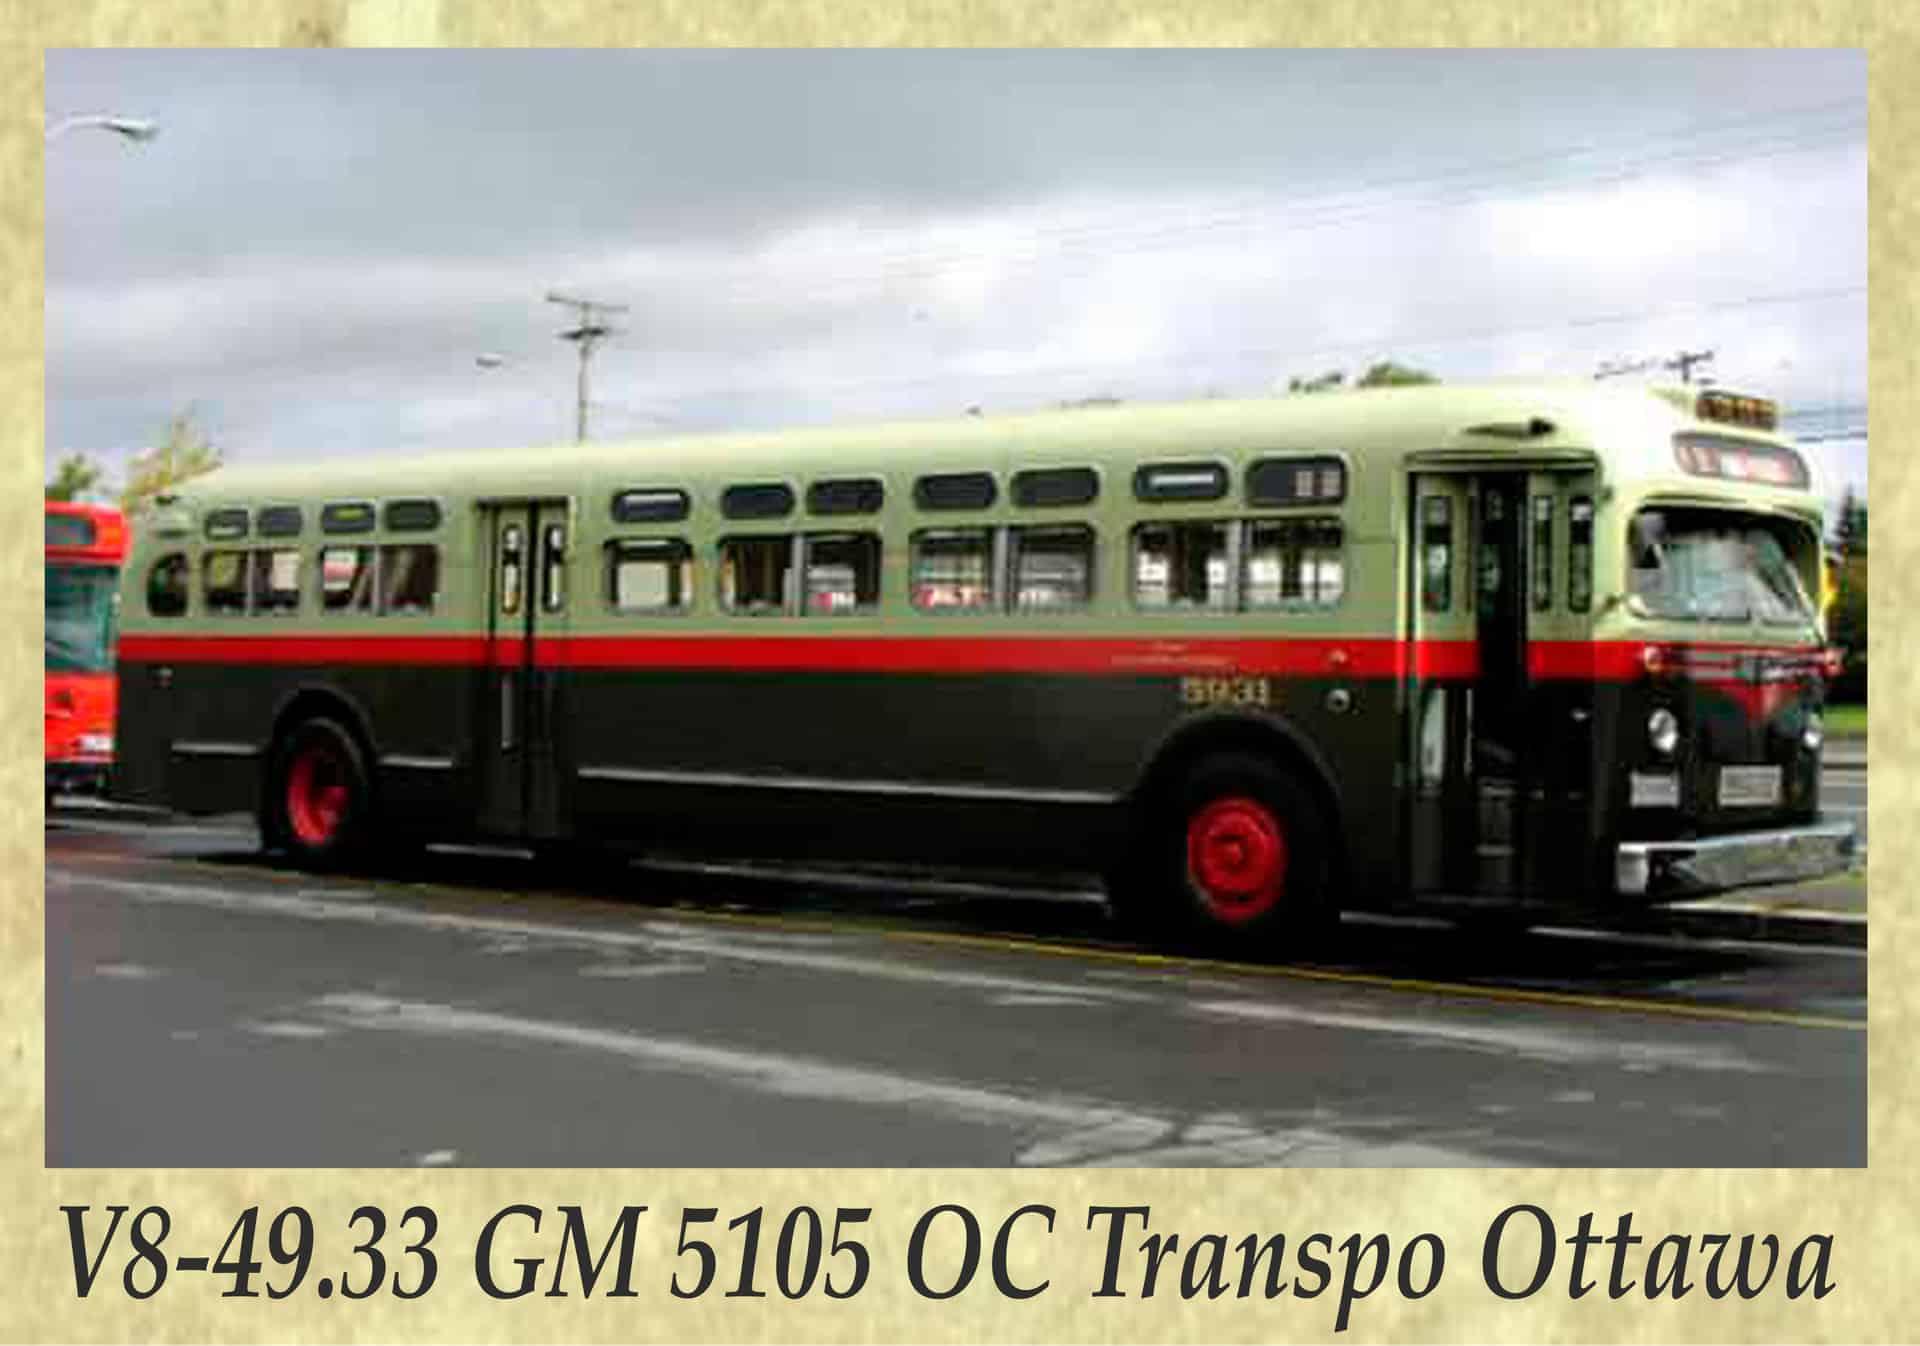 V8-49.33 GM 5105 OC Transpo Ottawa